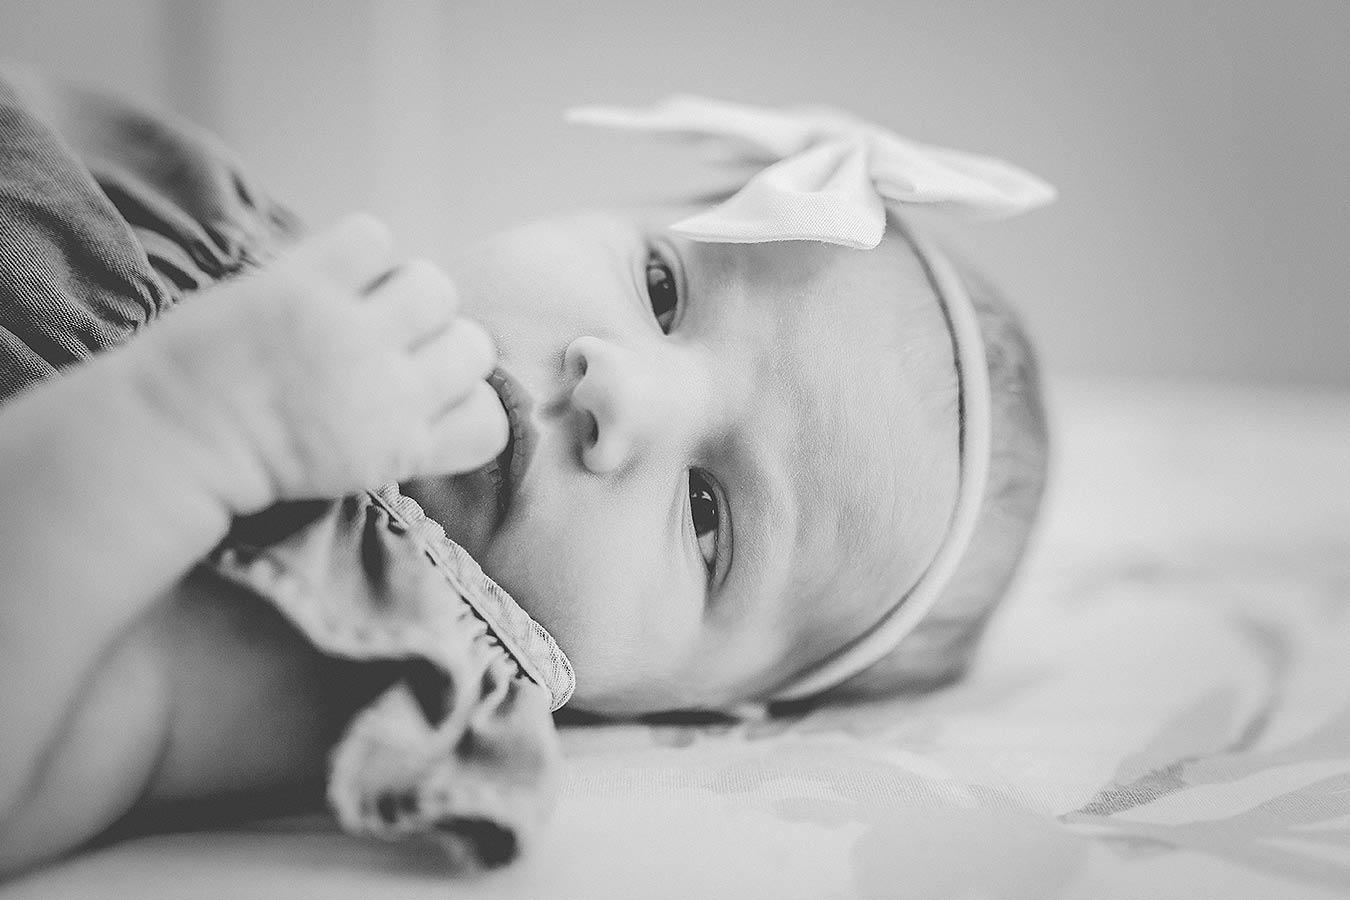 LoganUtahNewbornPhotographer-LifestyleNewbornPhotographyUtah-HeidiRandallStudios-Ellie-GirlNewbornPhotos-11.jpg